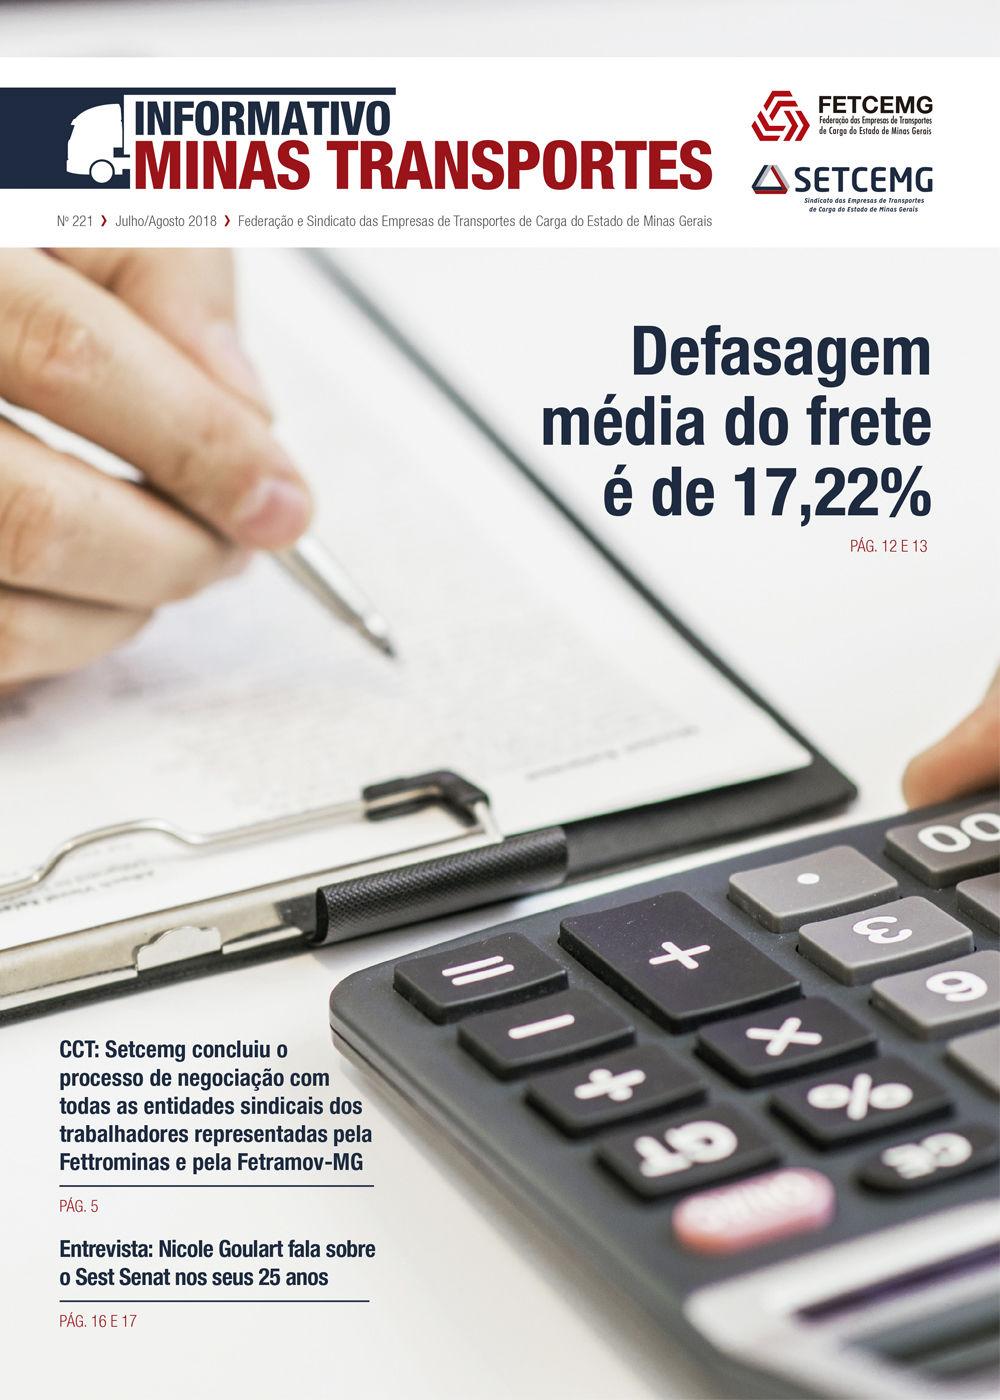 Informativo Minas Transportes - nº 221